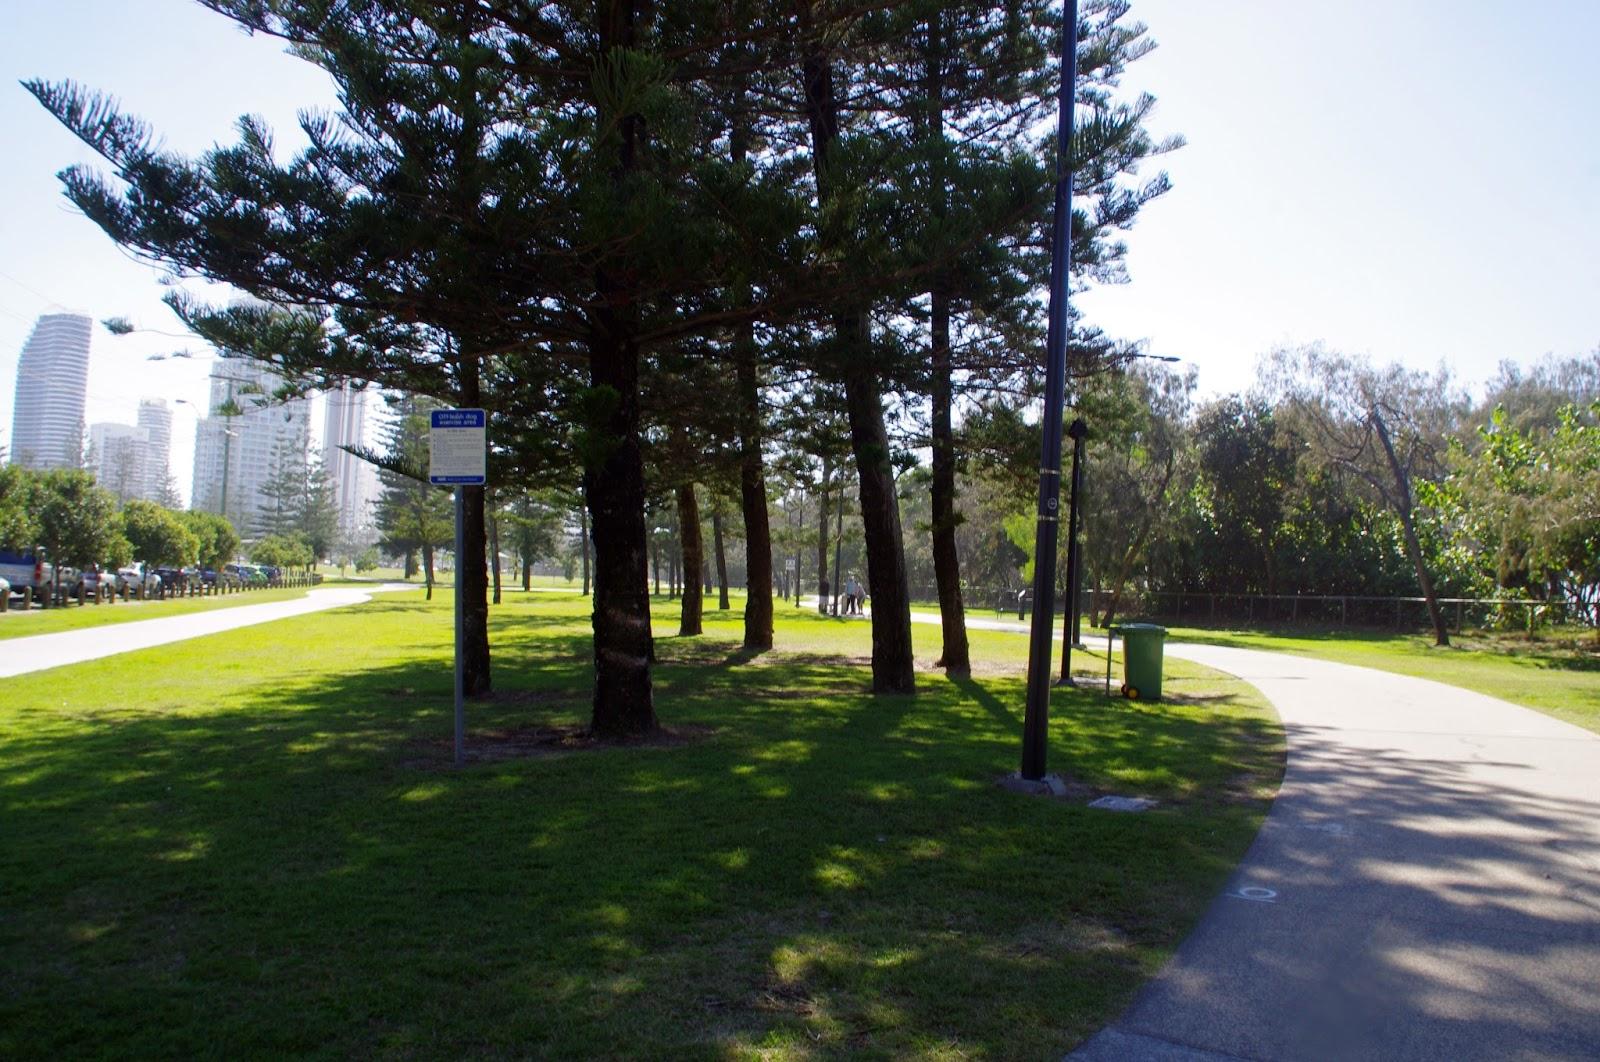 Broadbeach Walkway